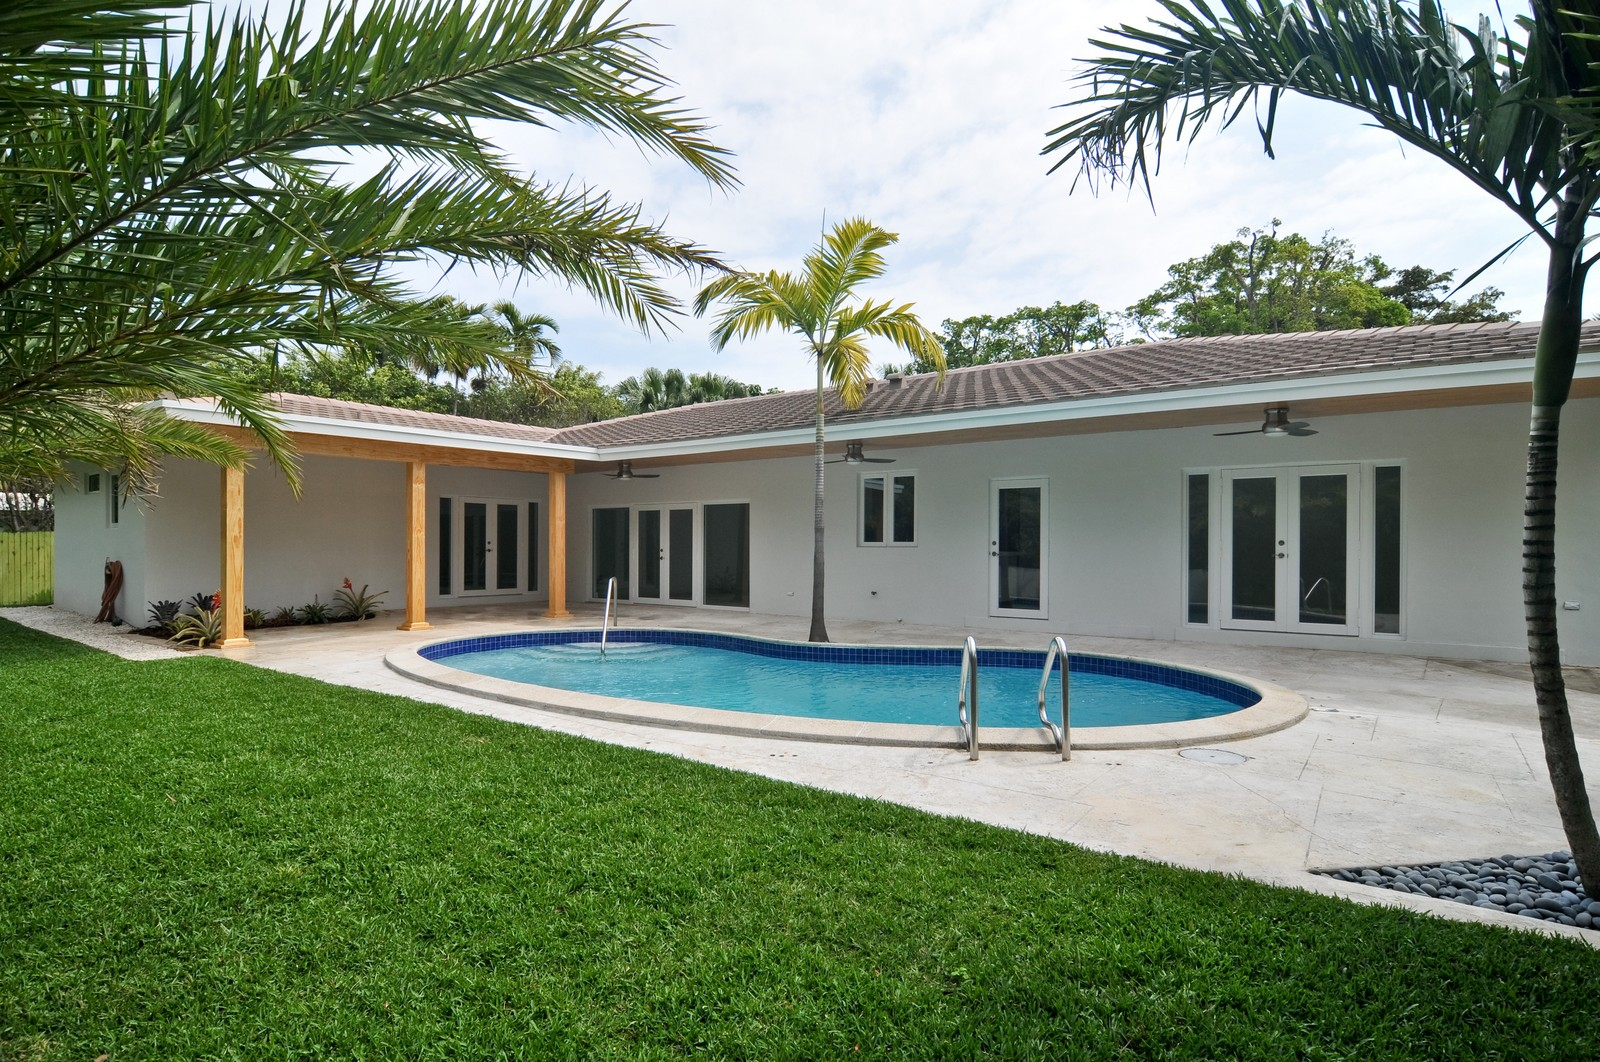 Real Estate Photography - 3645 Battersea, Miami, FL, 33133 - Back Yard